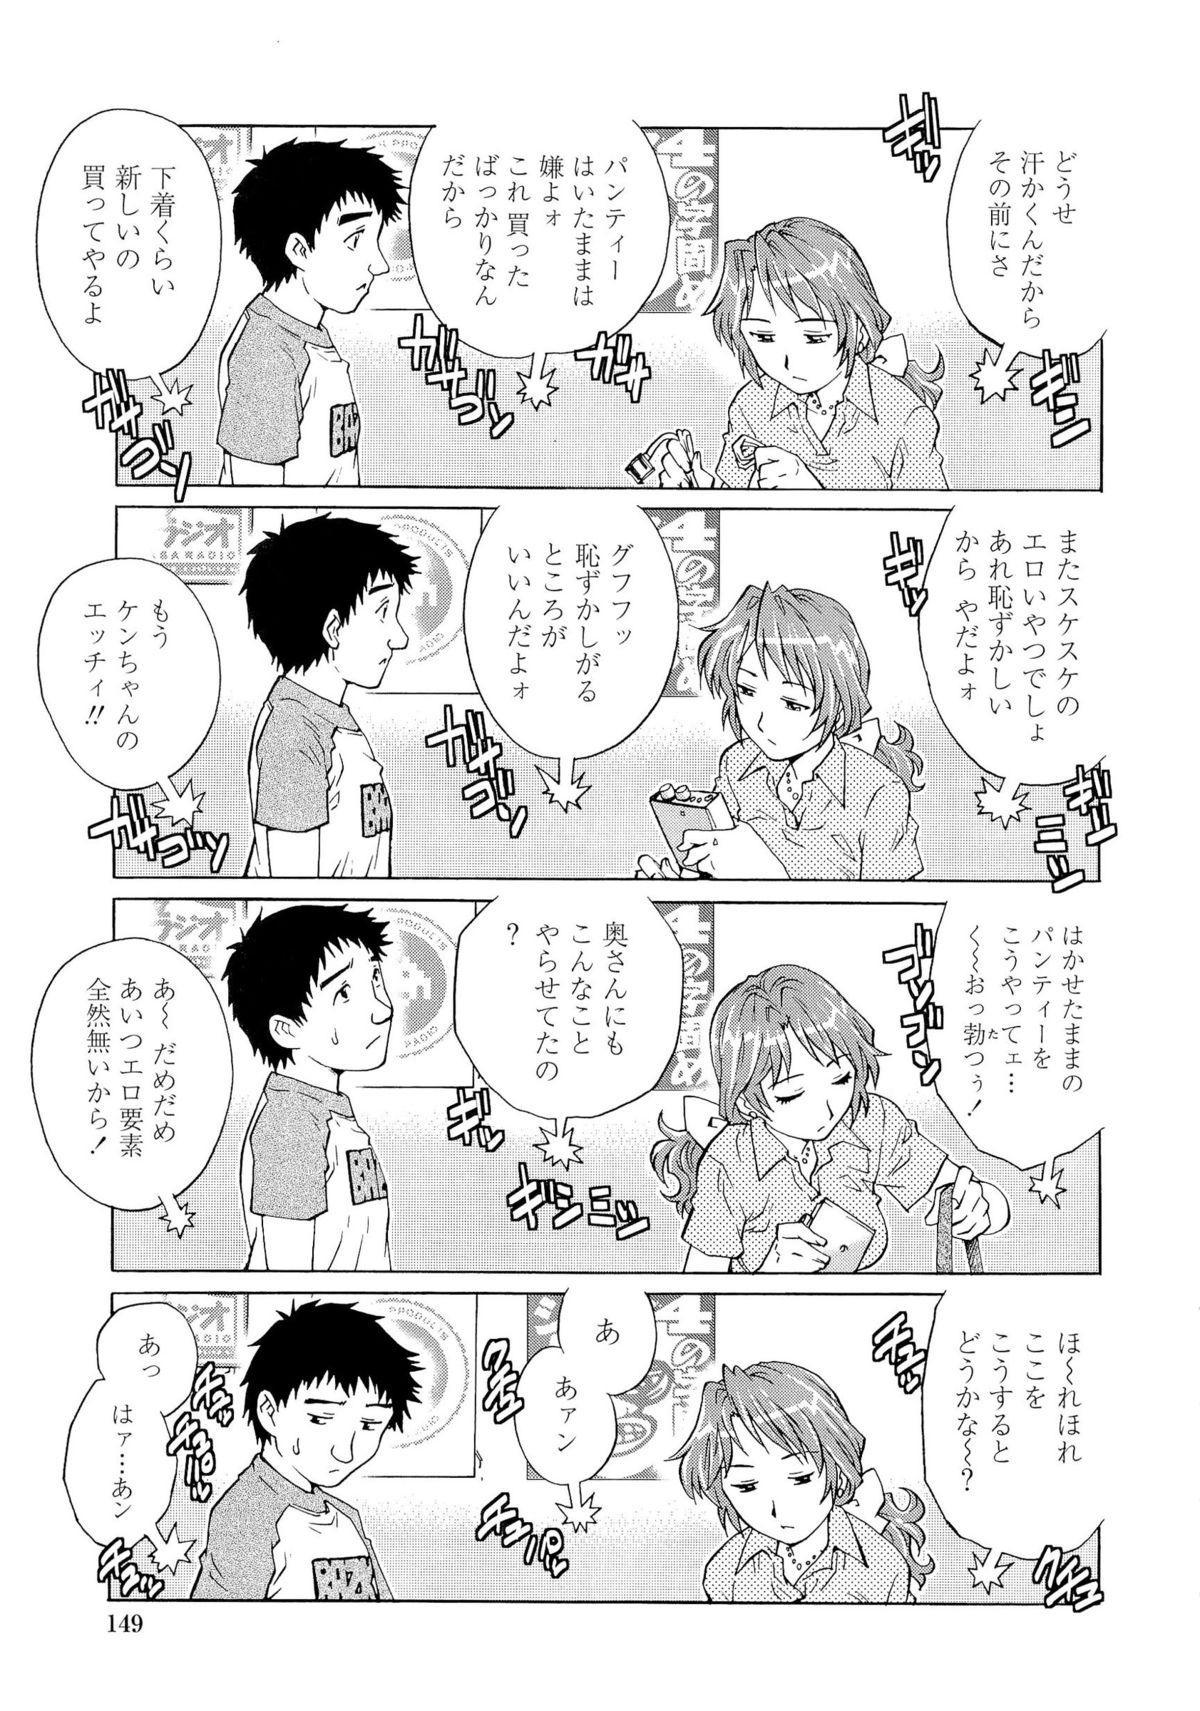 Nureteru Hitozuma - Wetly Wife 151